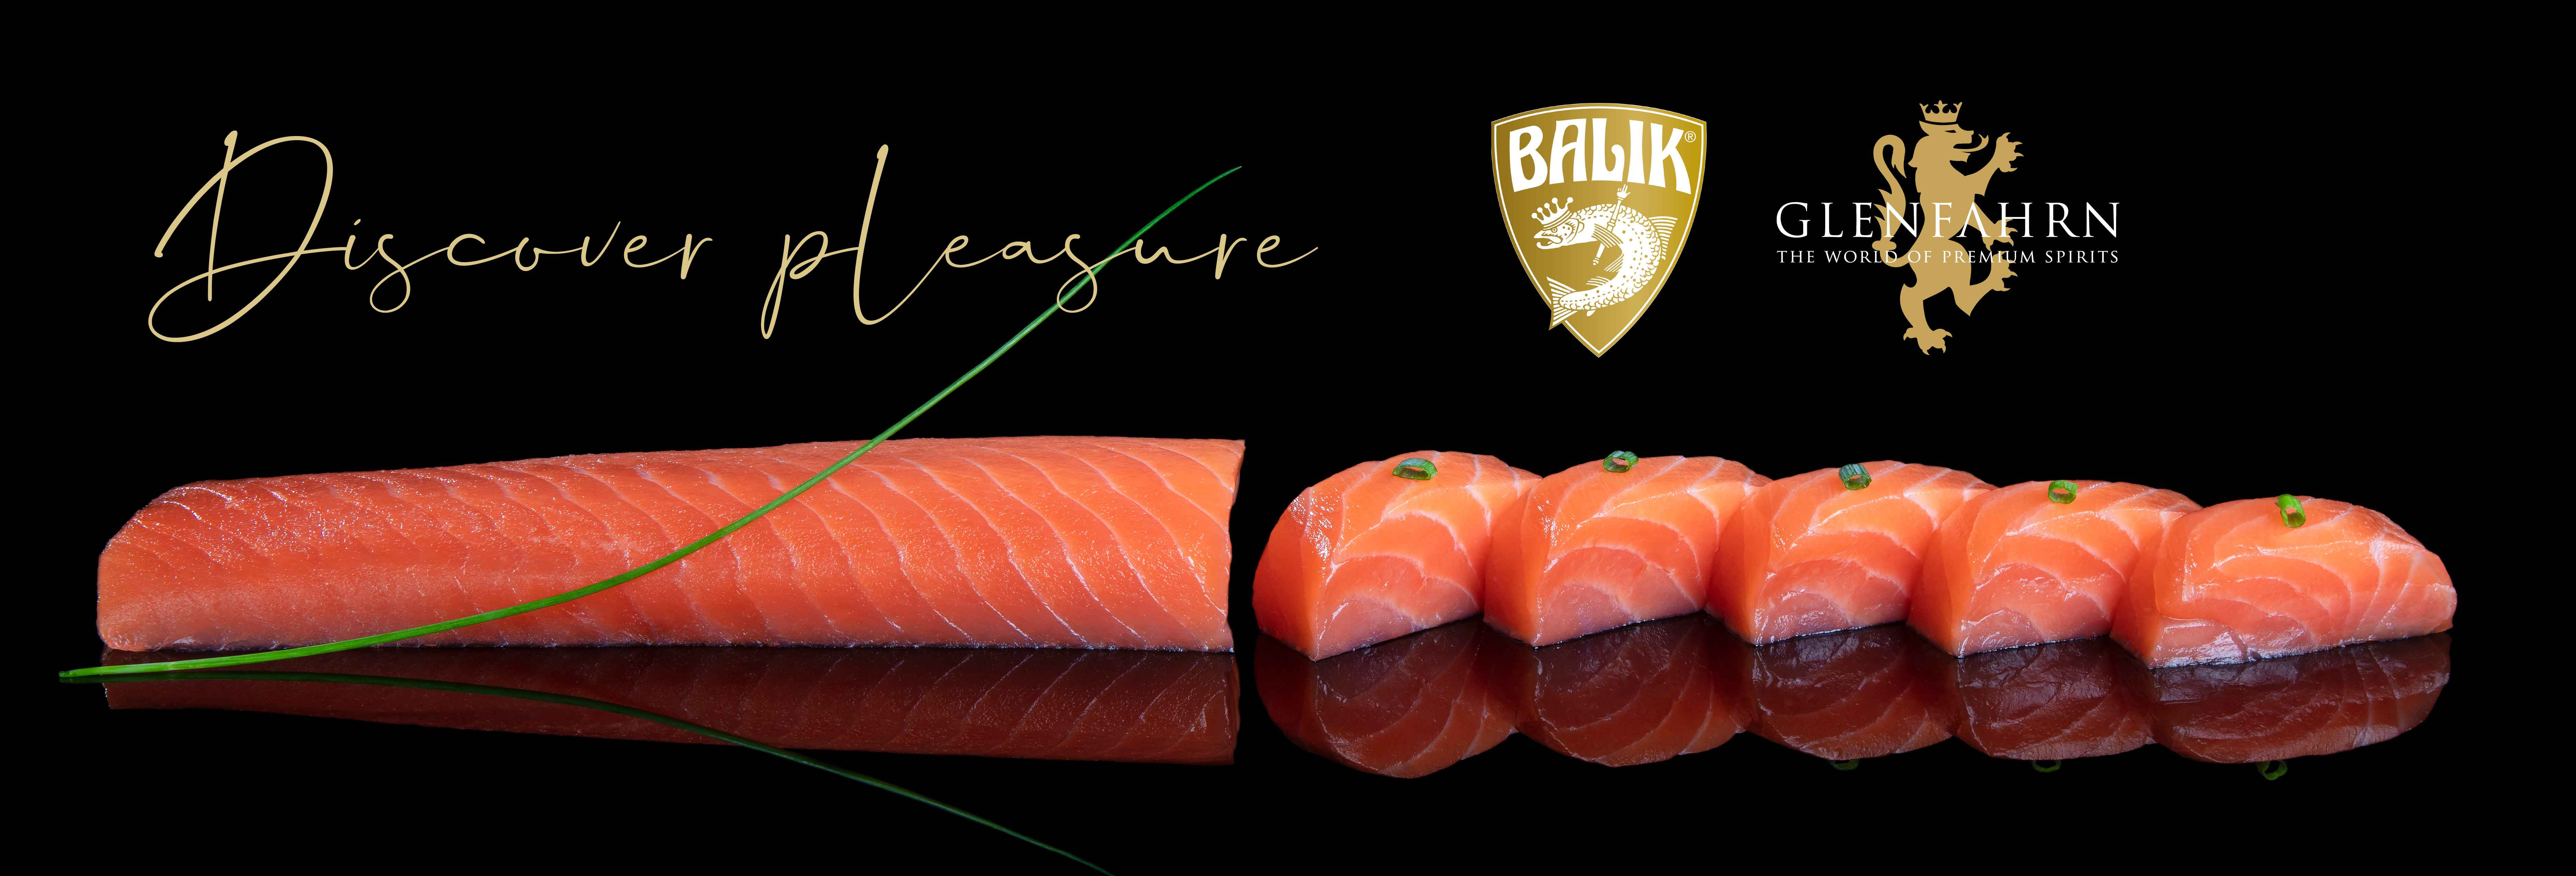 Discover Pleasure Balik & Glen Fahrn Lachs Premium Tastingsets